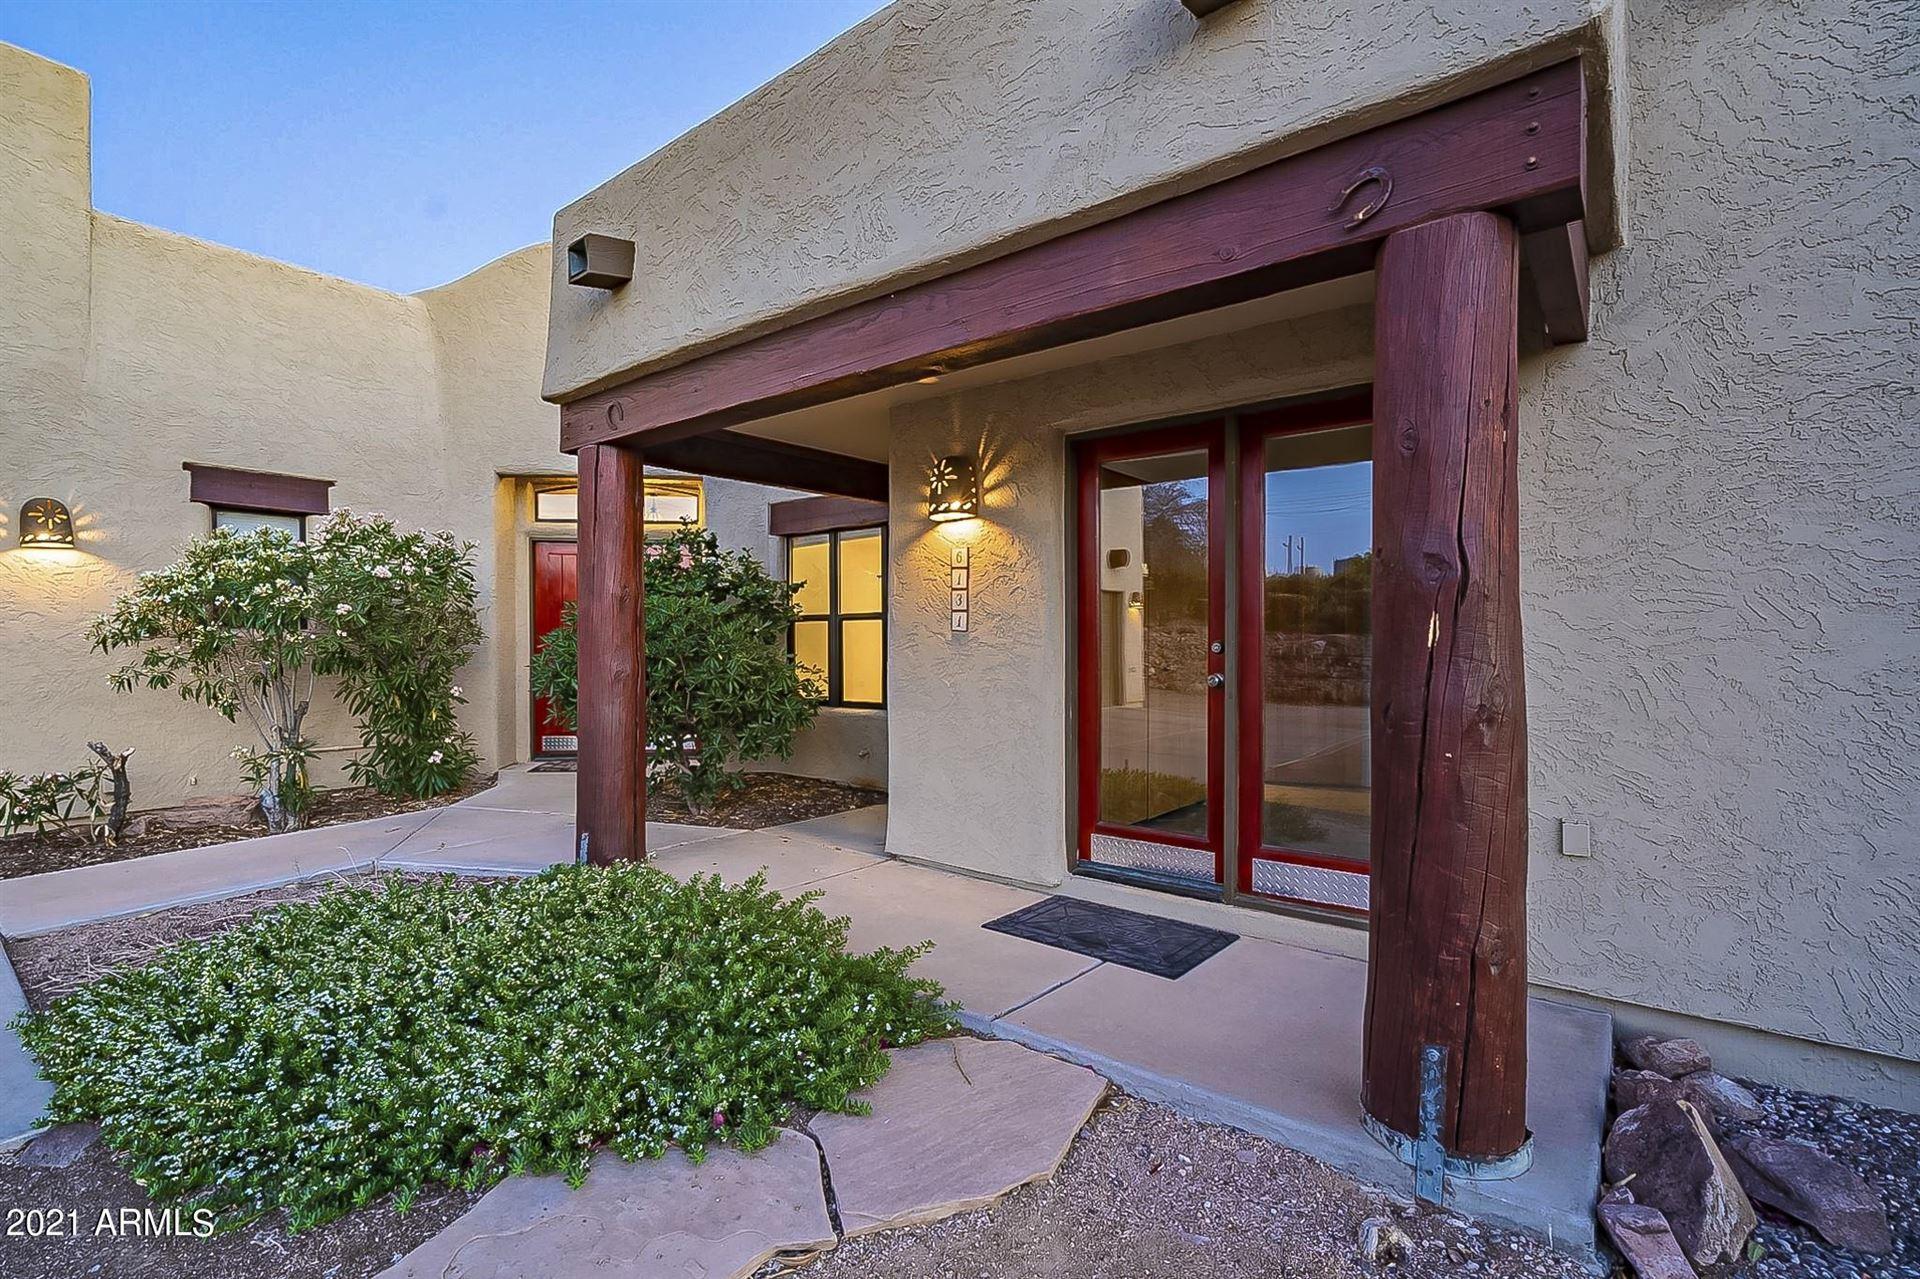 Photo of 6131 E Singletree Street, Apache Junction, AZ 85119 (MLS # 6231359)